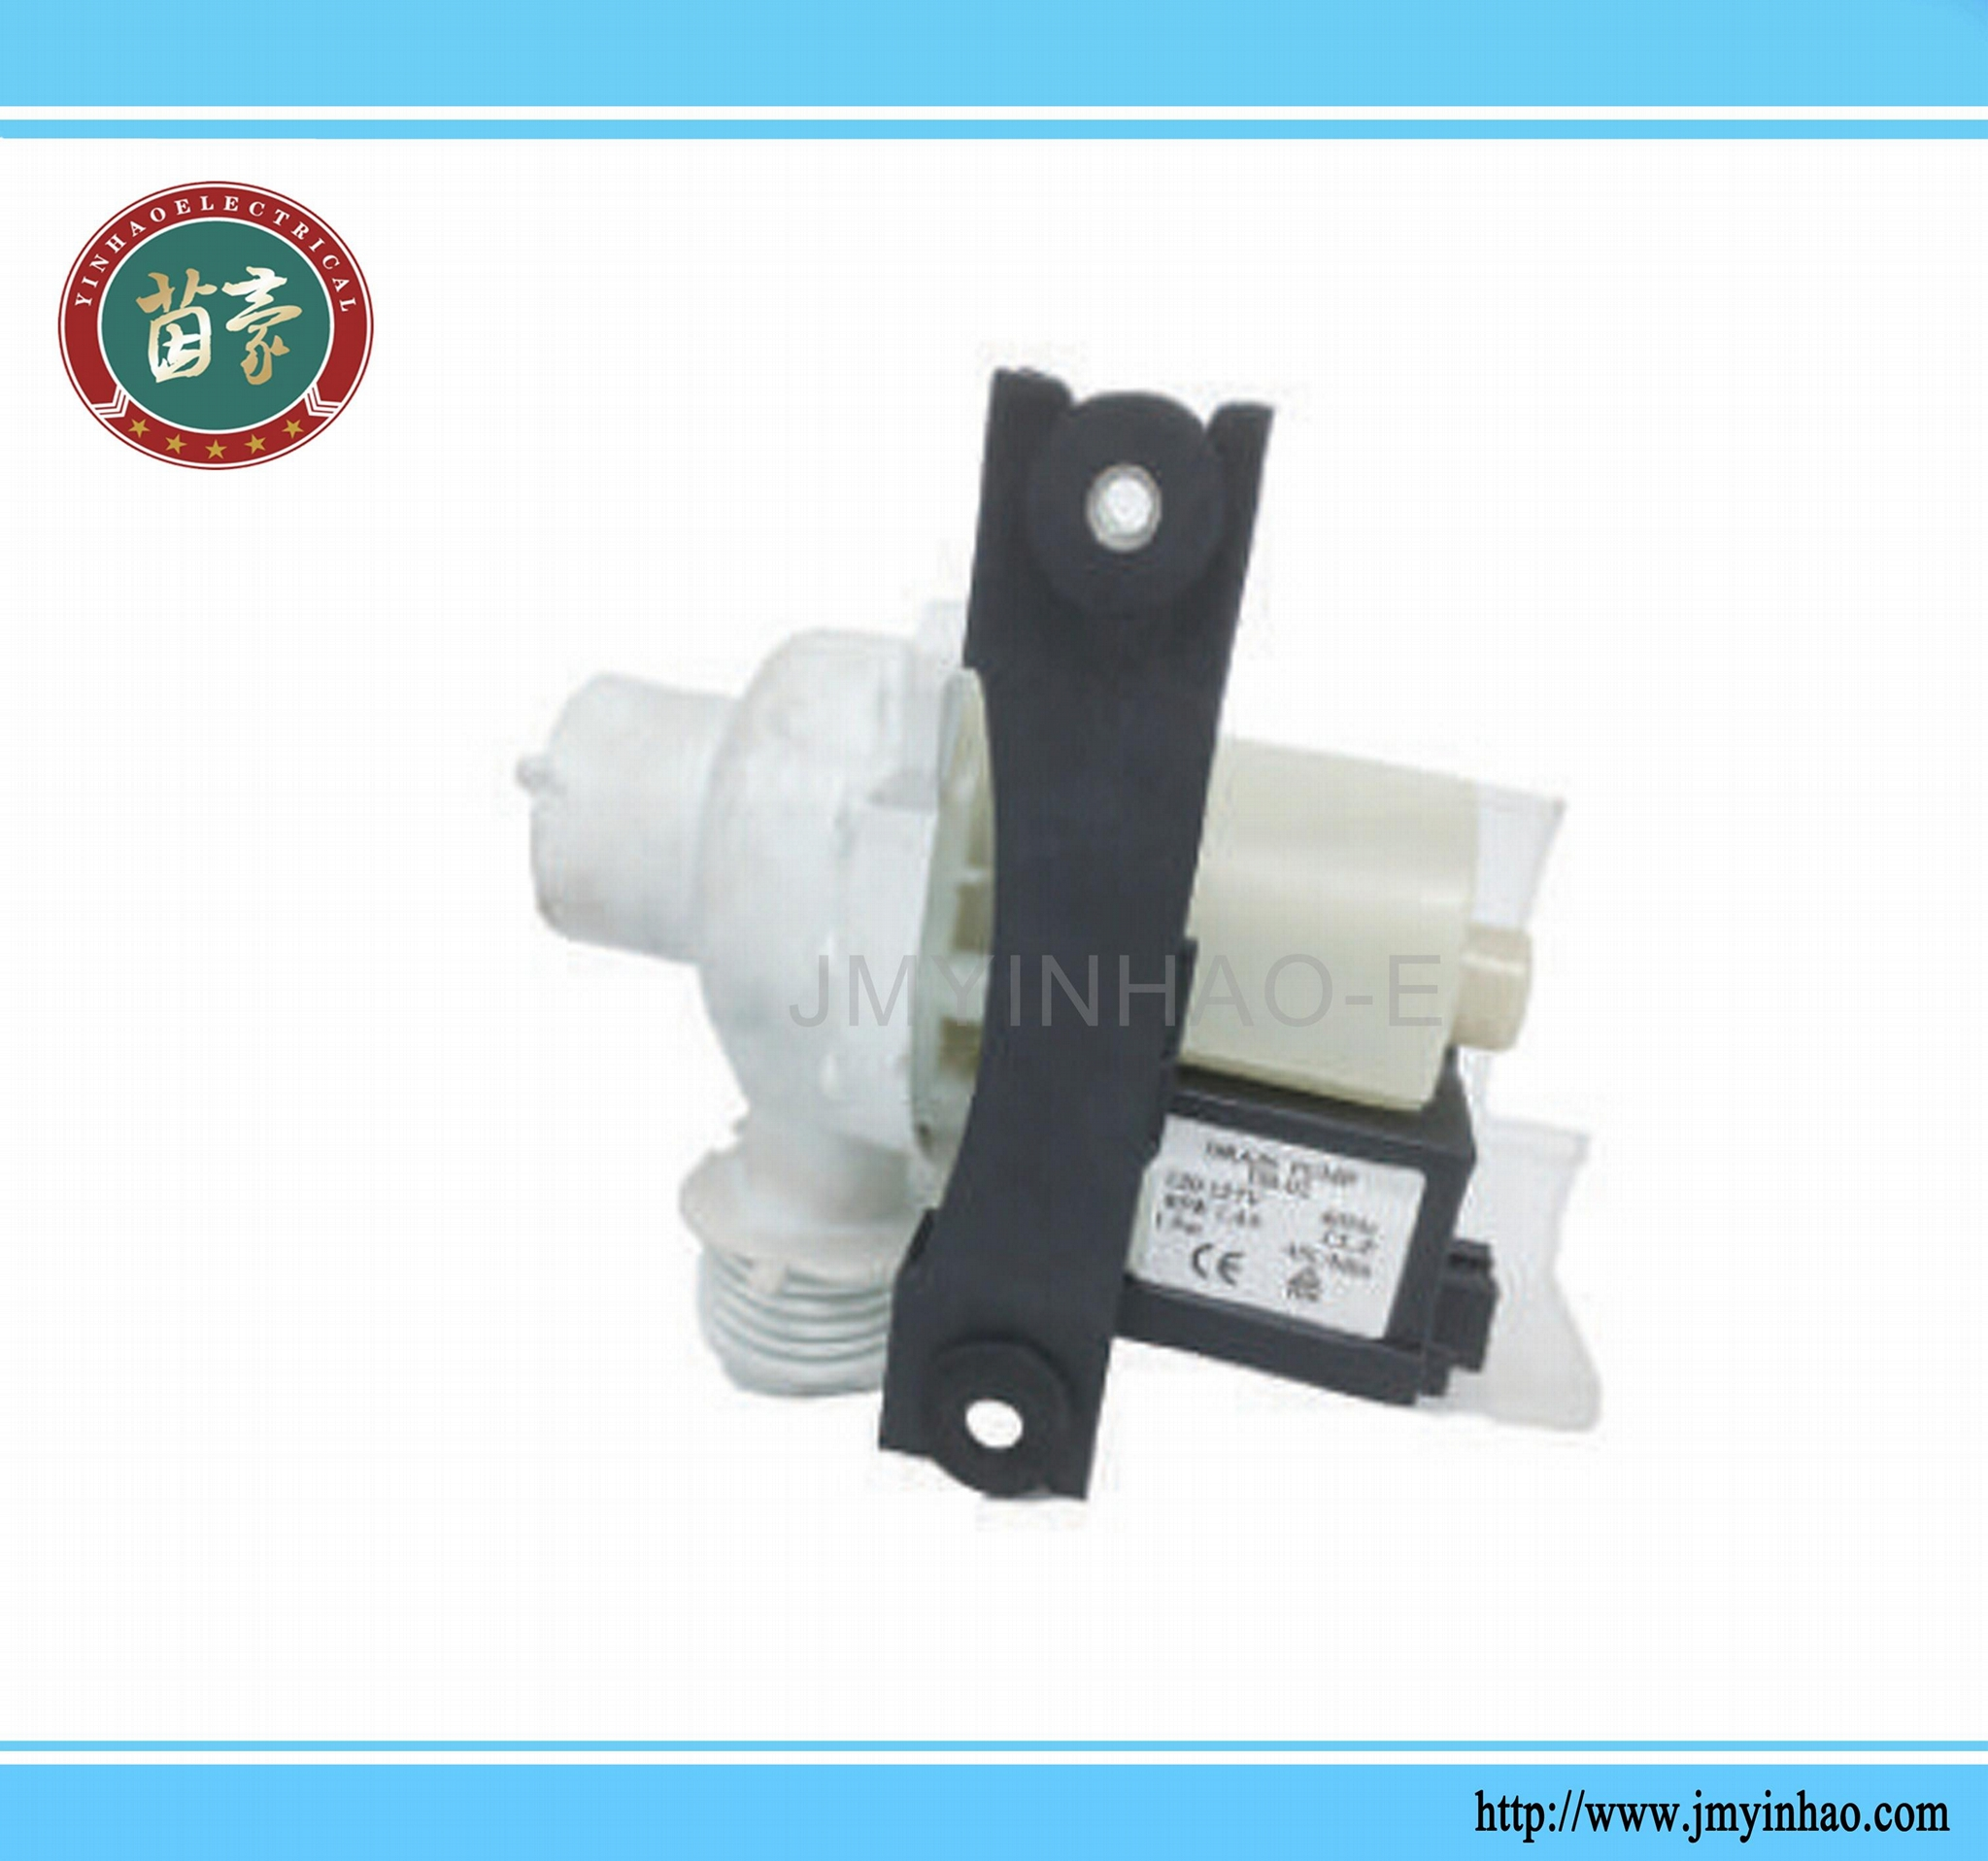 137221600 Replacement Frigidaire Washing Machine Drain Pump 137108100 134051200